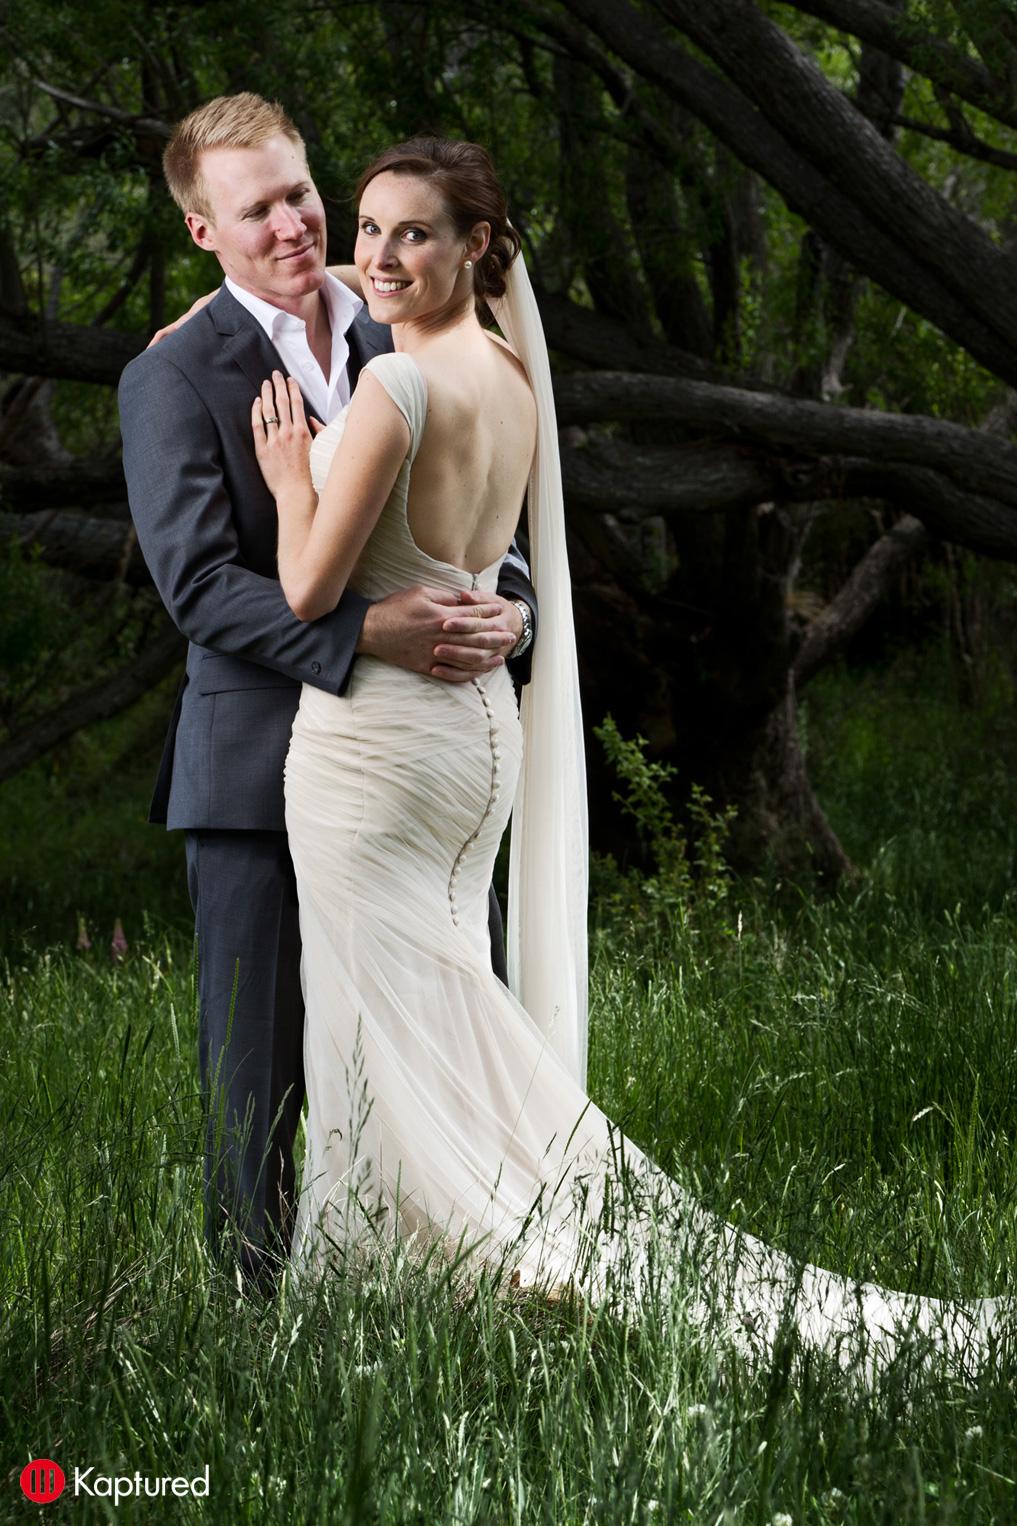 Danni - blush silk satin crepe, silk tulle - Castle Rock bride - Kaptured Photography